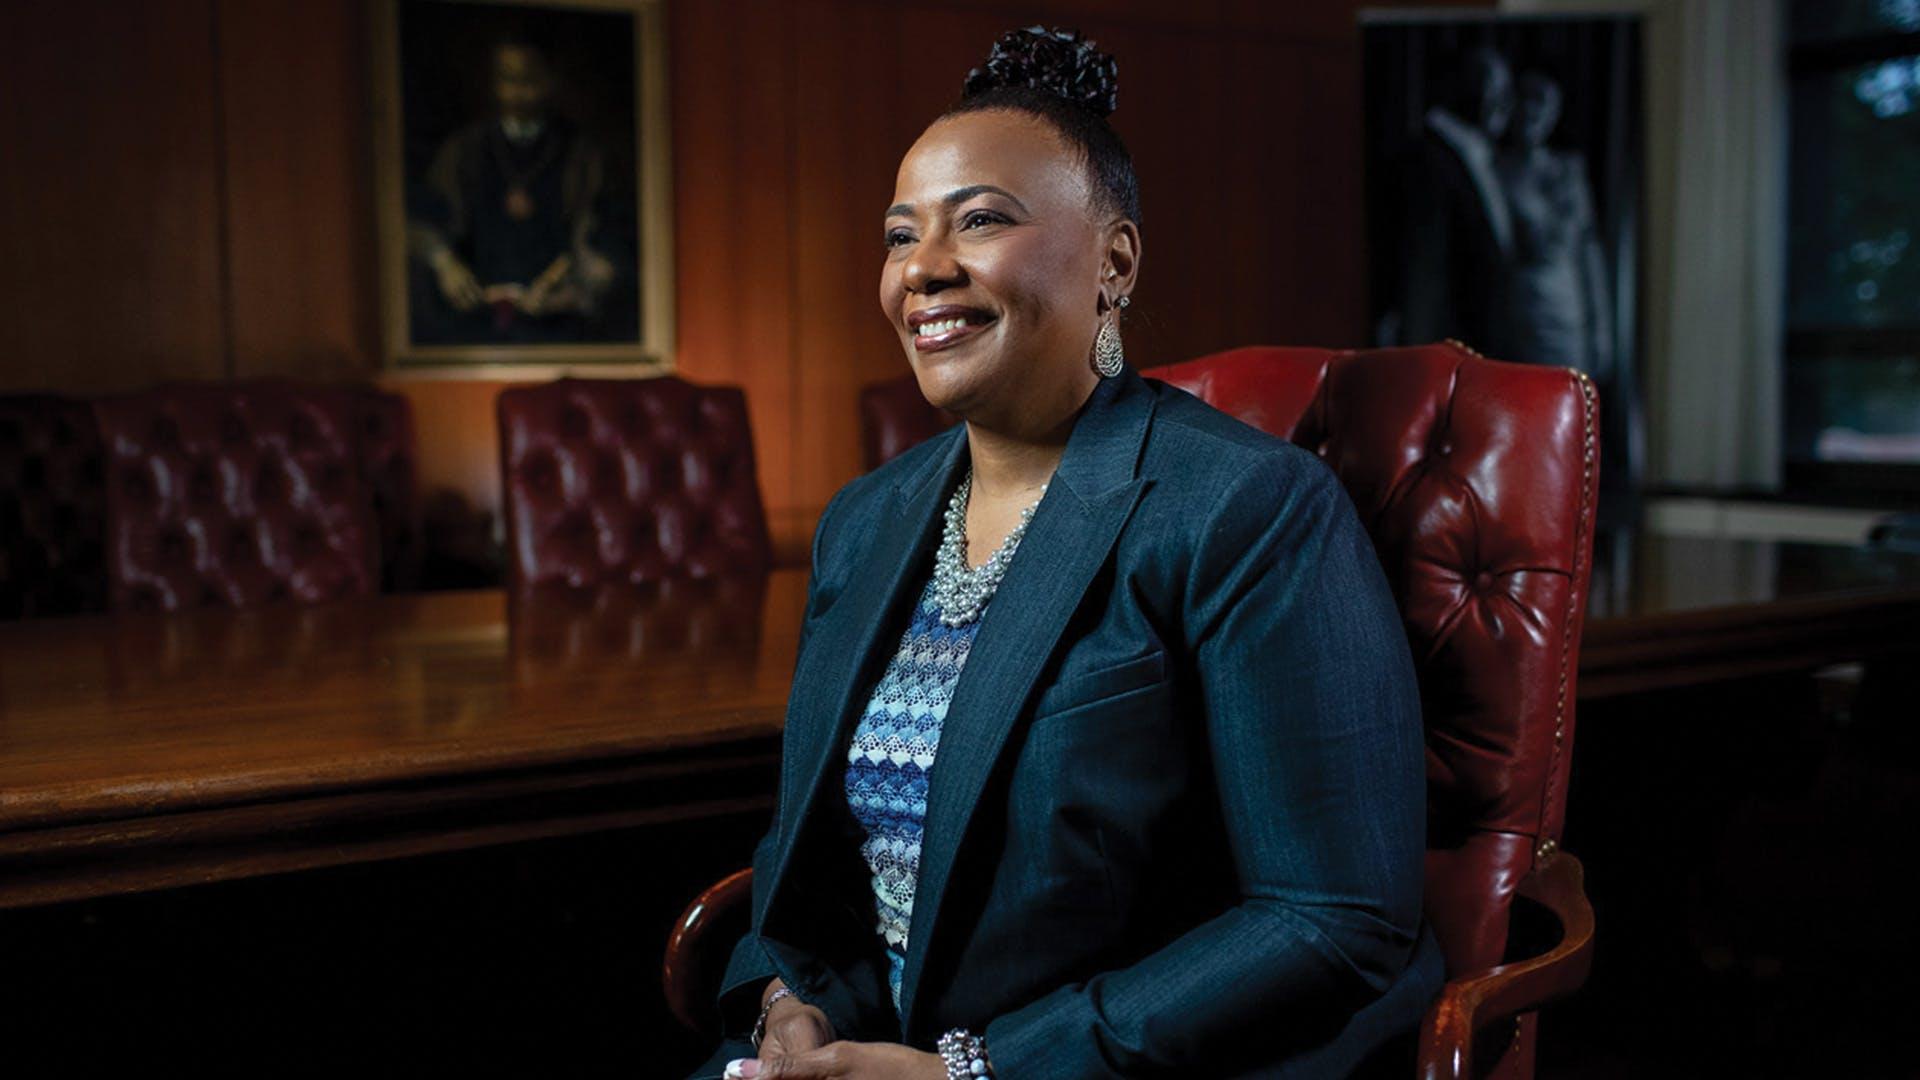 I Thought I Understood Forgiveness, Then I Met Dr. King's Daughter: Bernice King